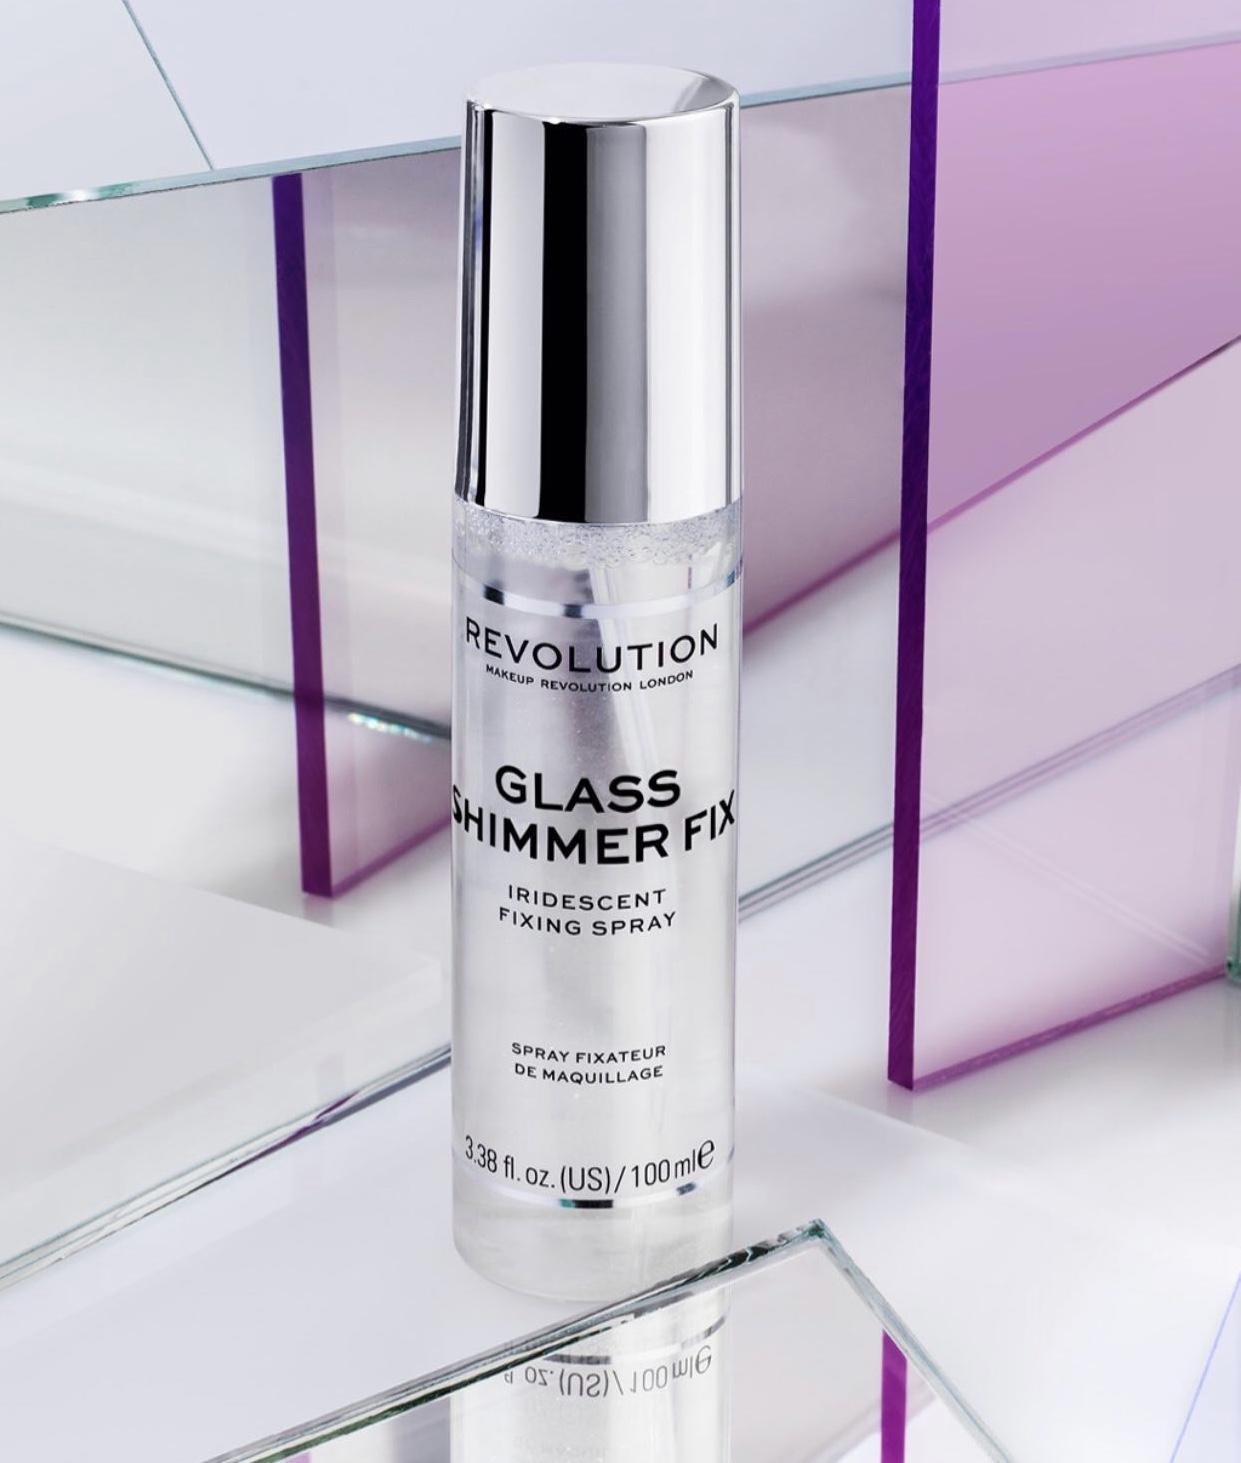 Revolution Glass Shimmer Fix Iridescent Fixing Spray